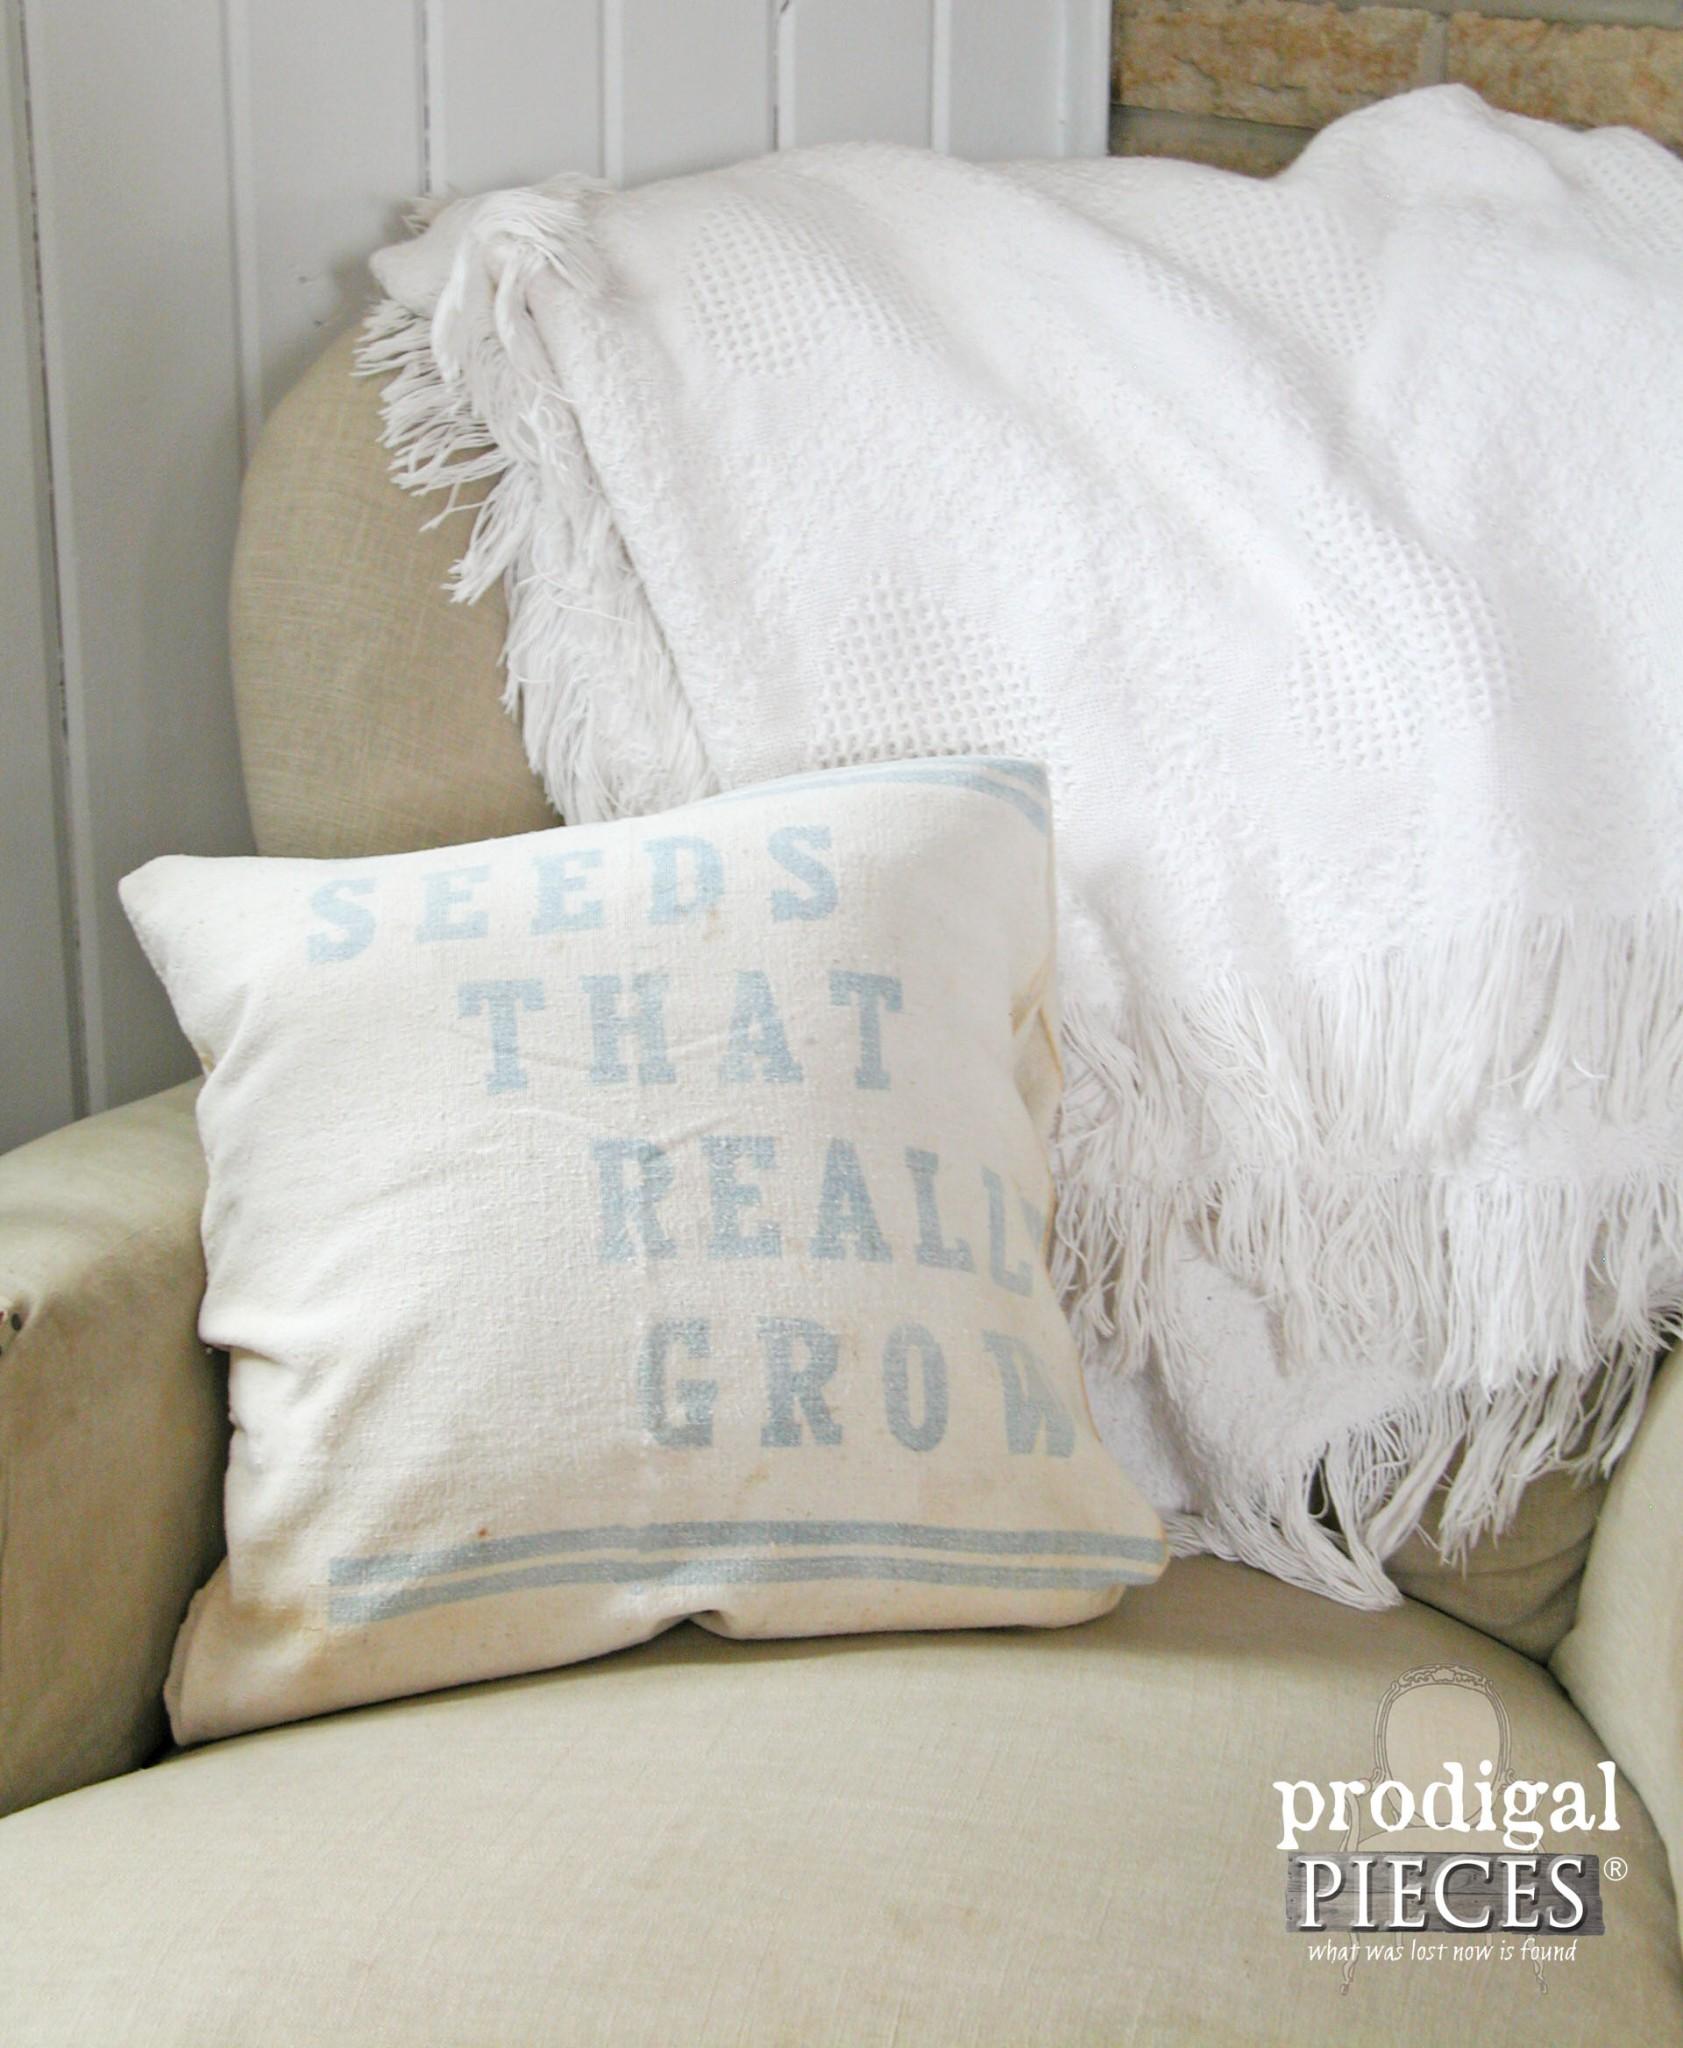 Vintage Feedsack Pillow | Prodigal Pieces | www.prodigalpieces.com